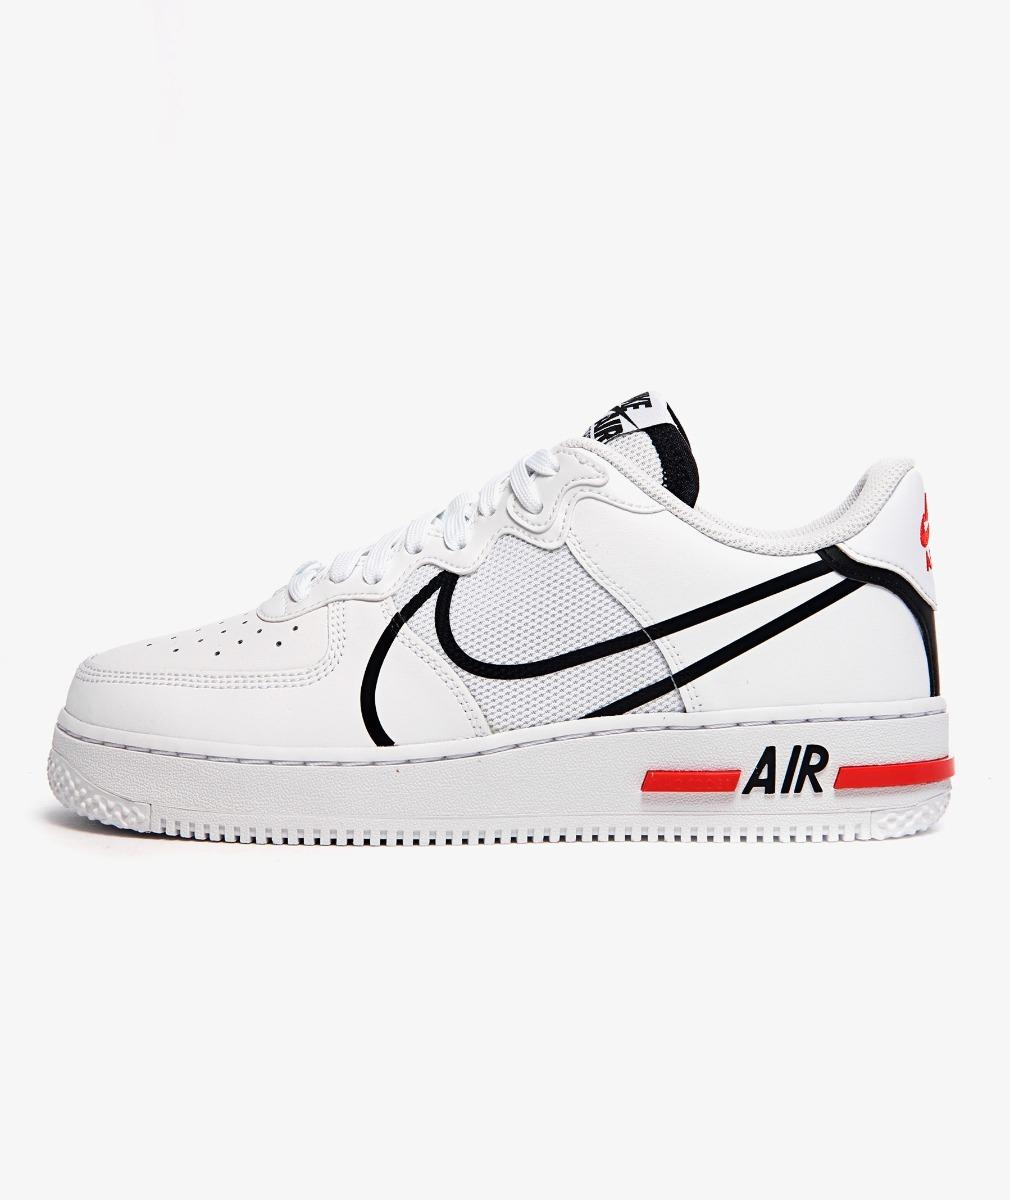 NIKE AIR FORCE 1 REACT(WHITE/BLACK-UNIVERSITY RED)